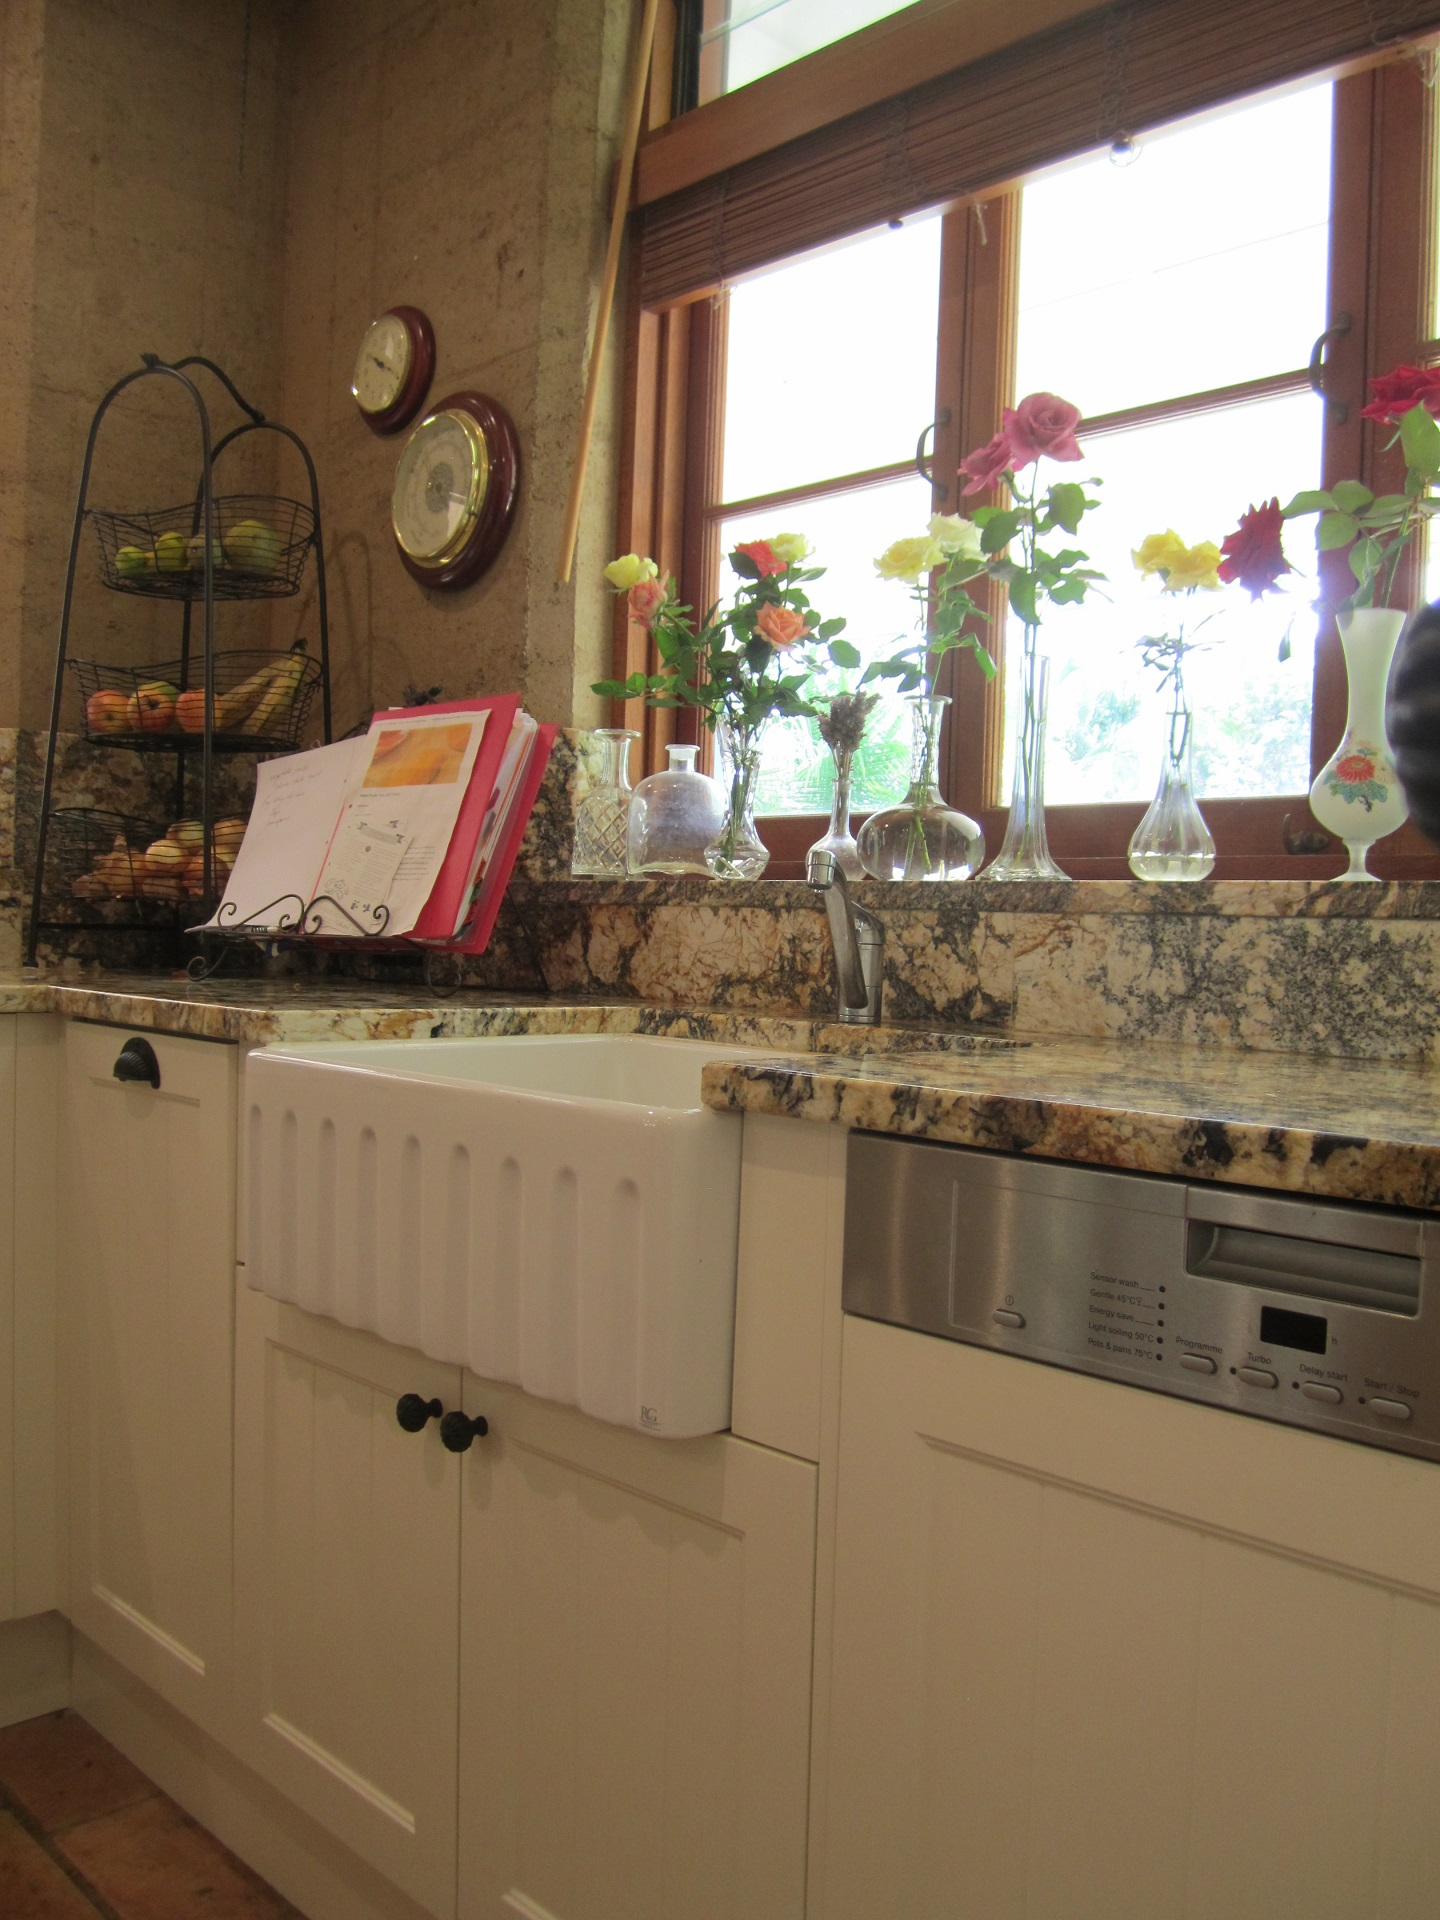 Brisbane Kitchen Design Samford  Traditional Kitchen  Belfast Sink Semi Integrated Dishwasher(12)